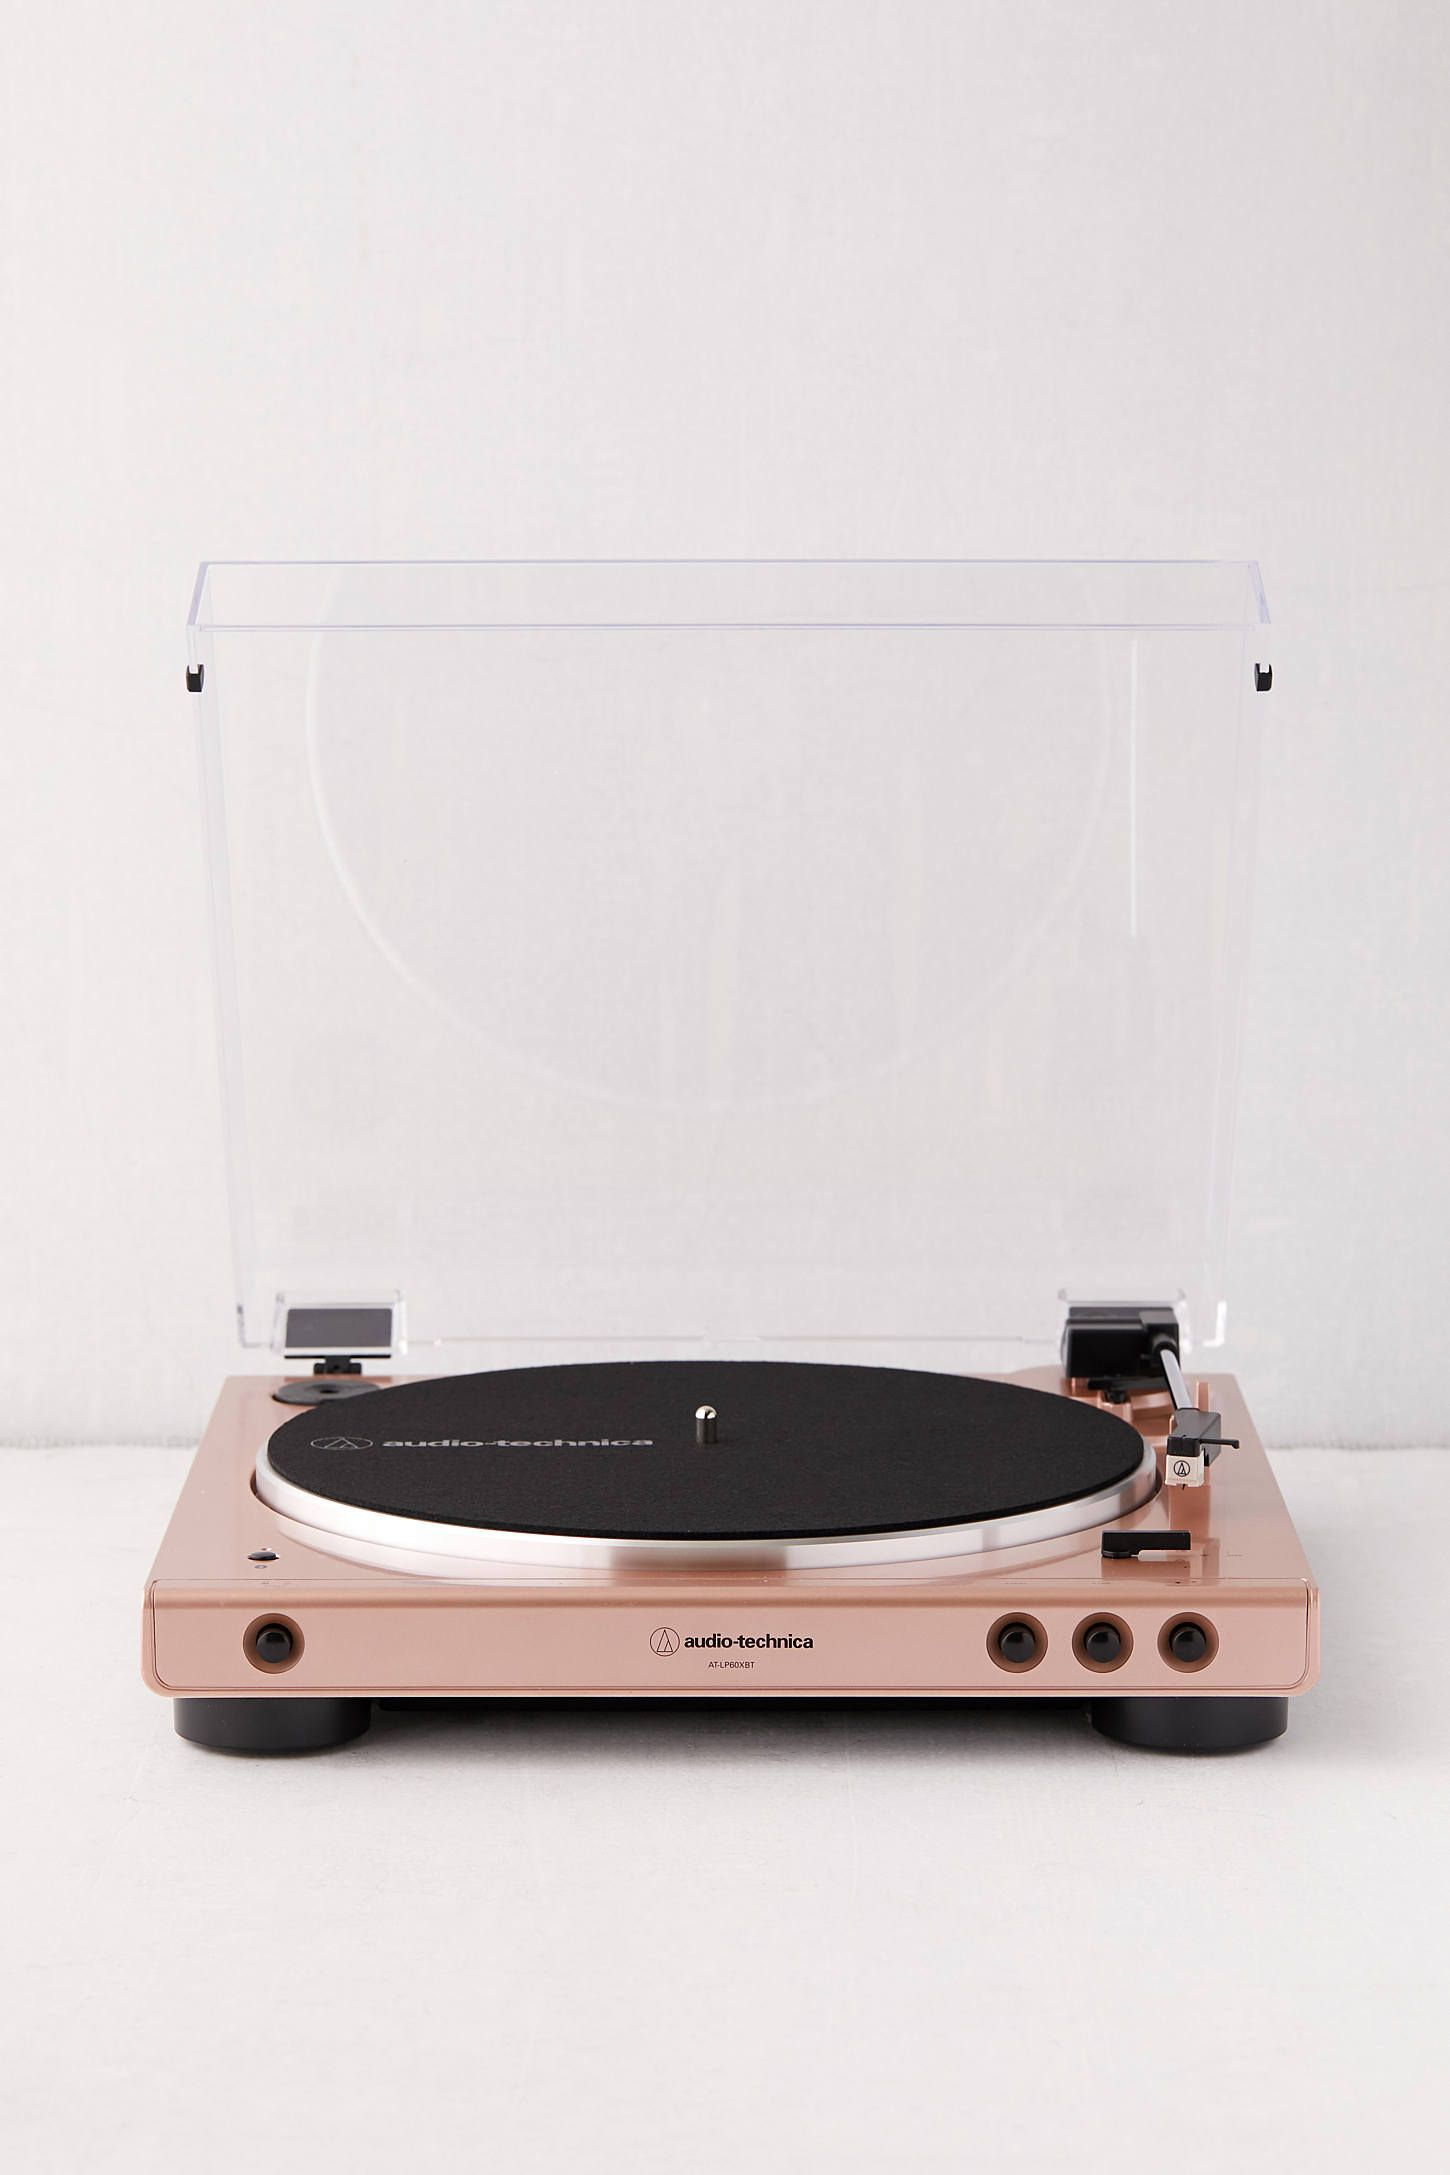 17 Audio Technica Lp60 Record Player Ideas In 2021 Audio Technica Record Player Audio